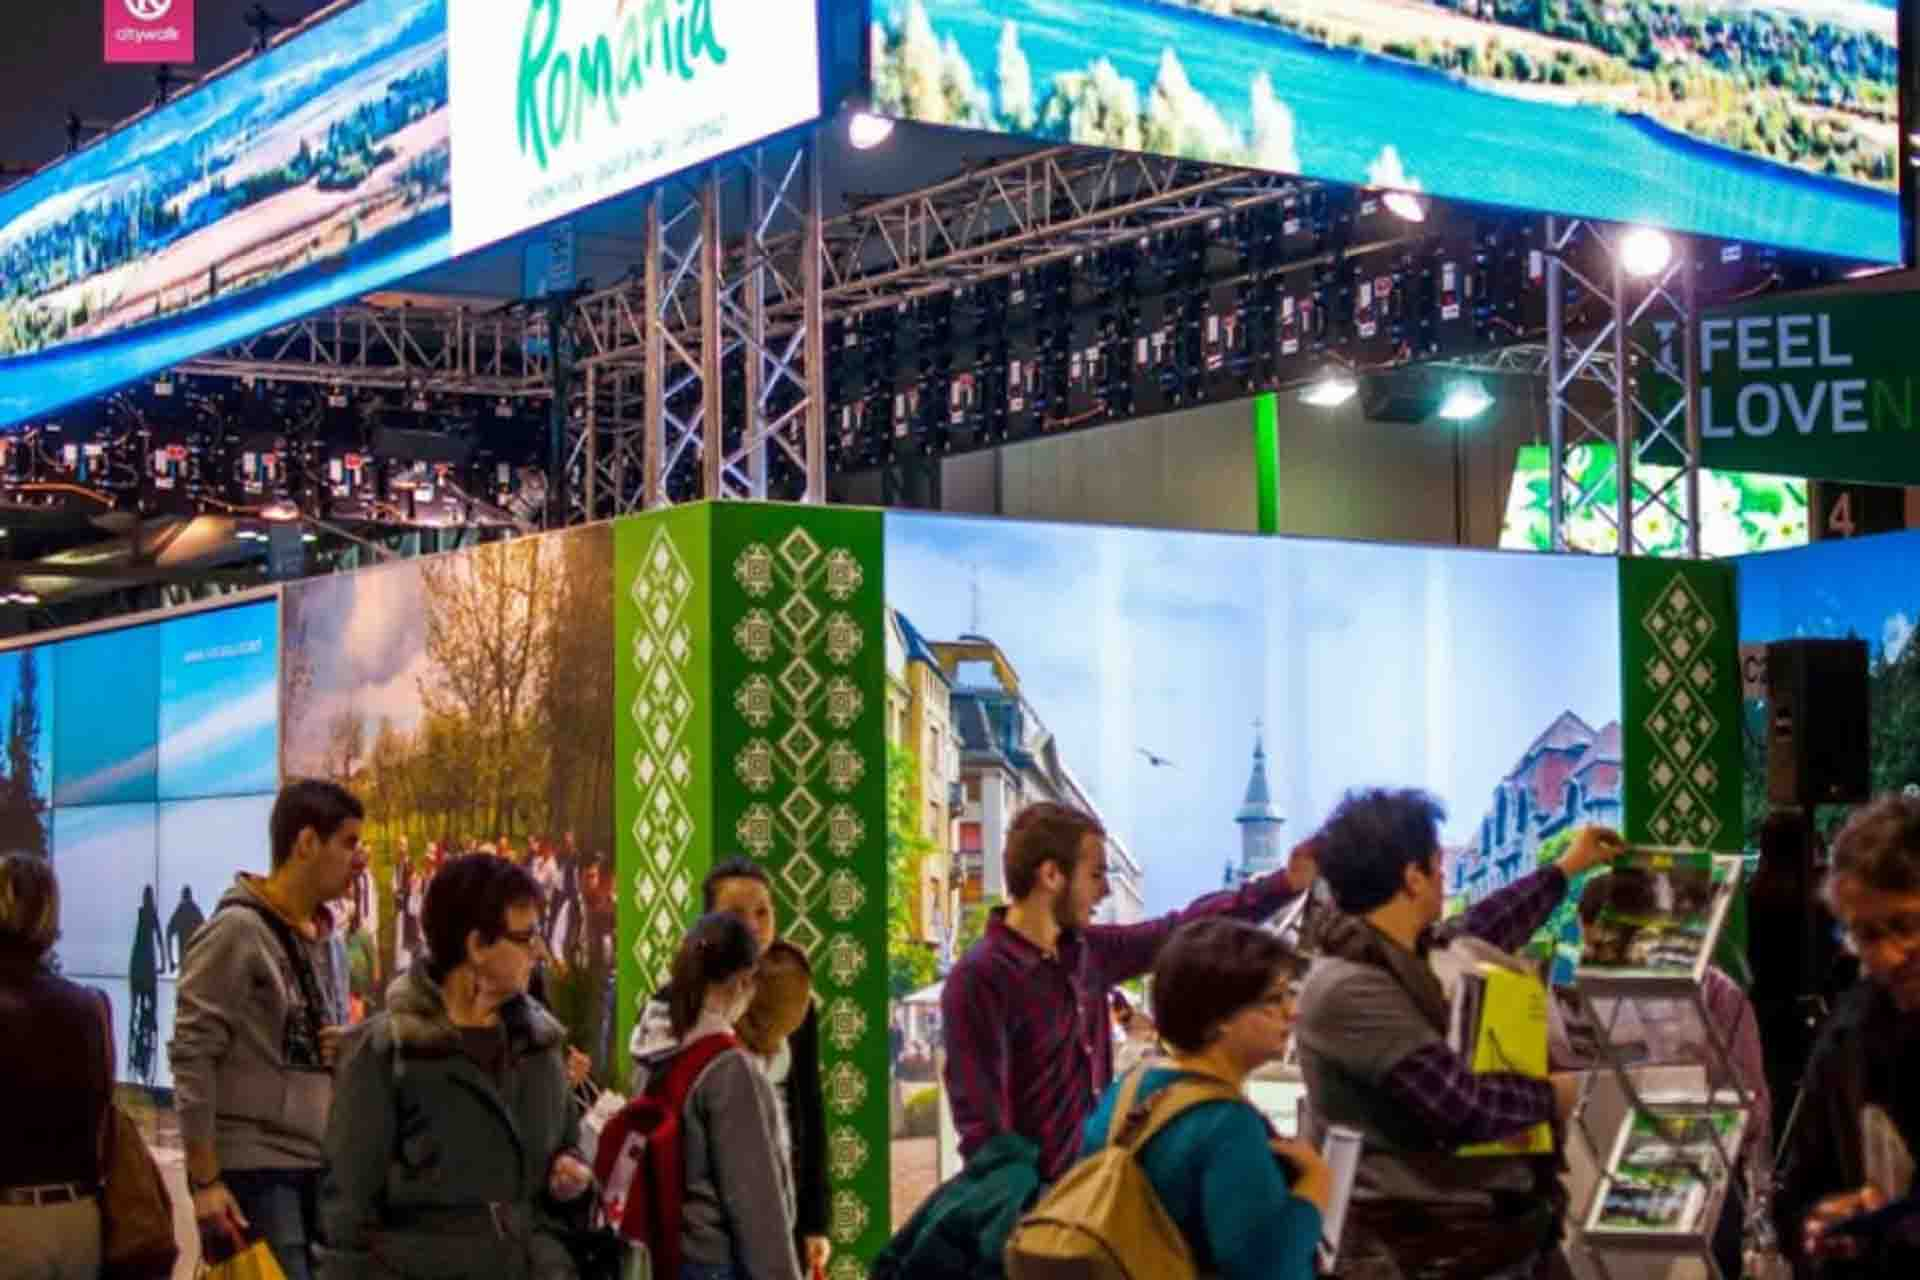 True Romania Tours - Exhibited at international travel fairs